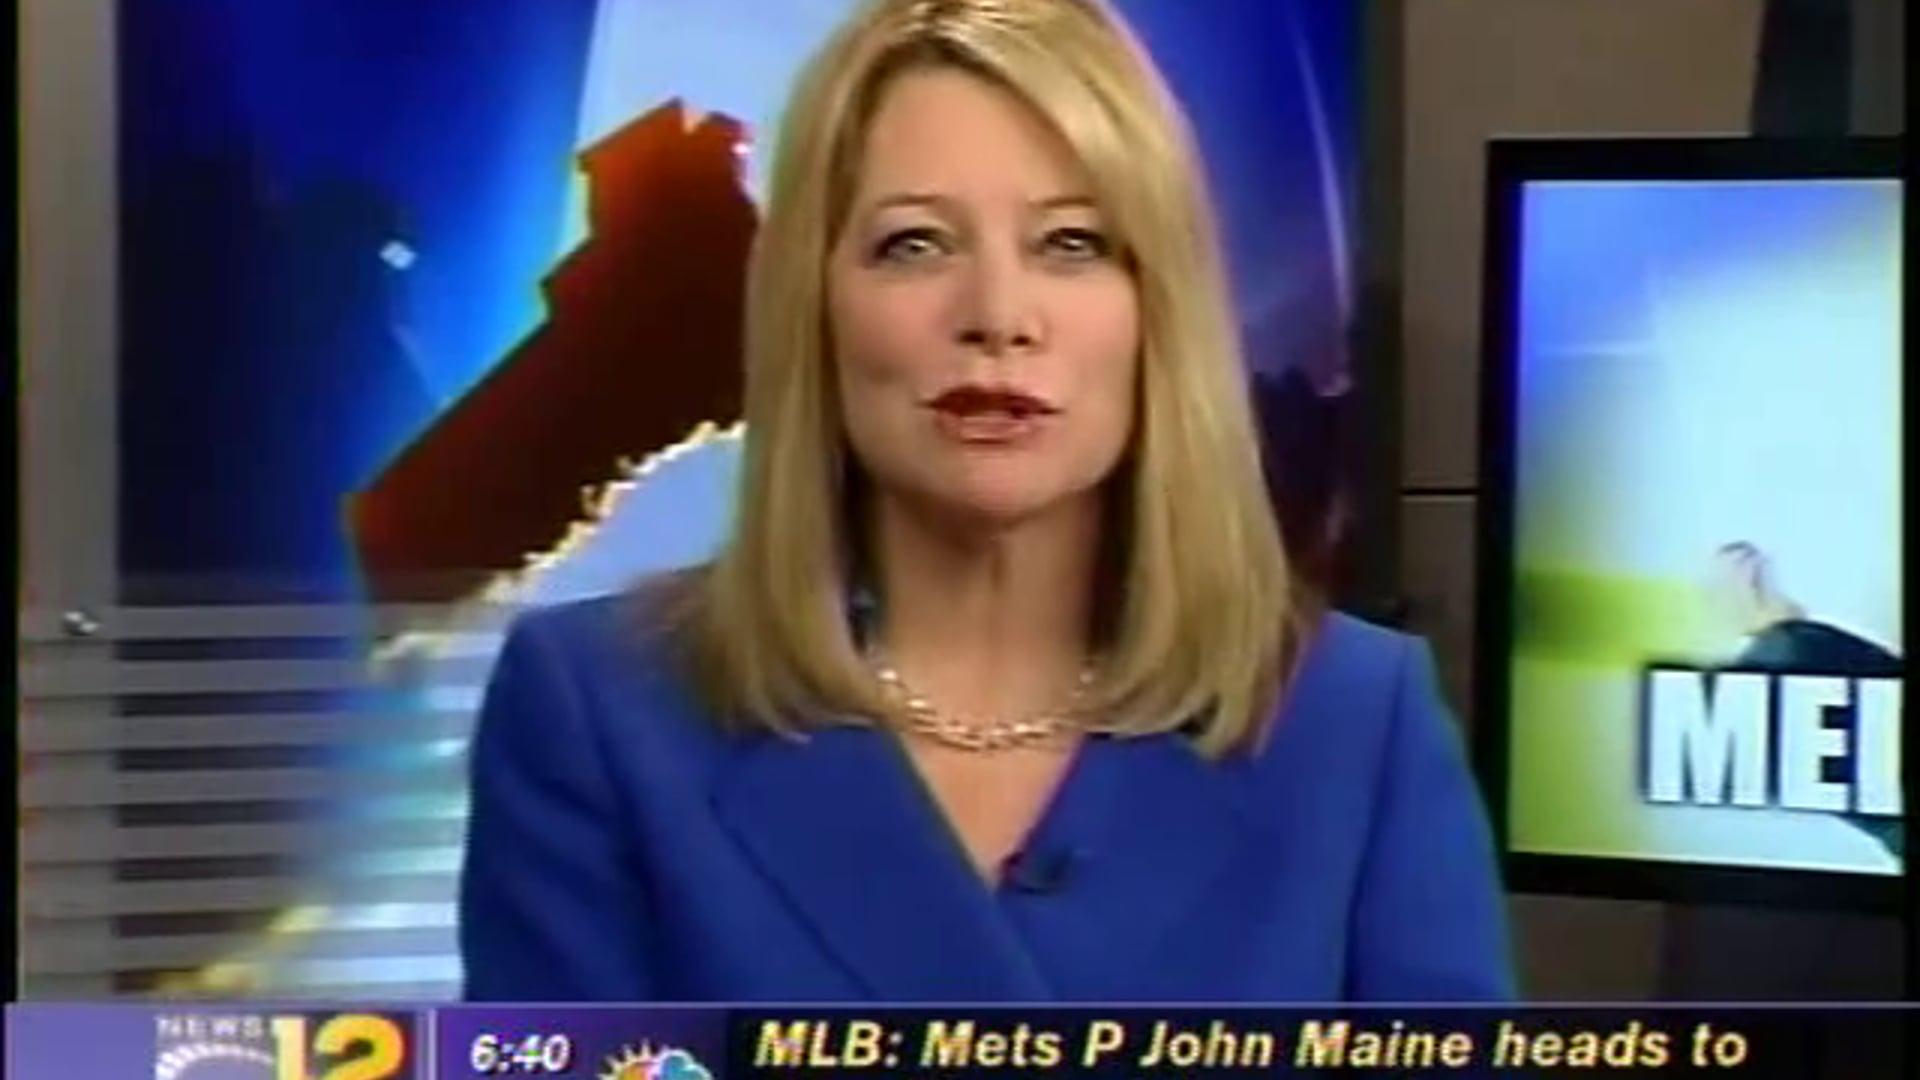 NEWS 12 CONNECTICUT: Women's Sports Injury Program at Yale University